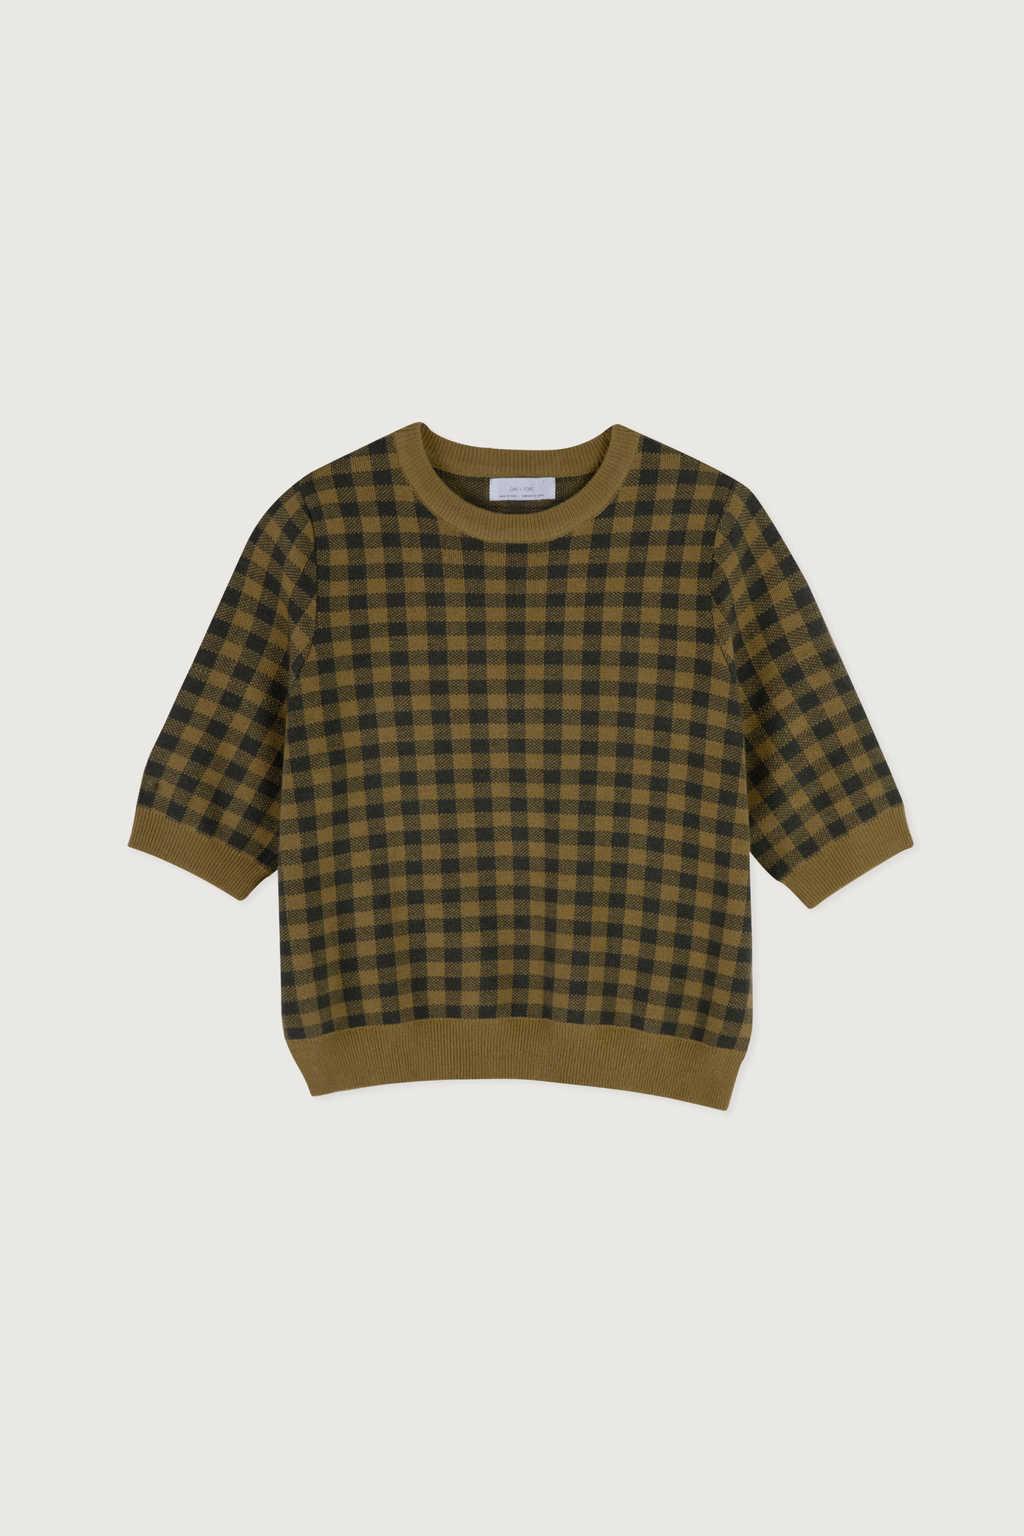 Sweater 3165 Olive 2